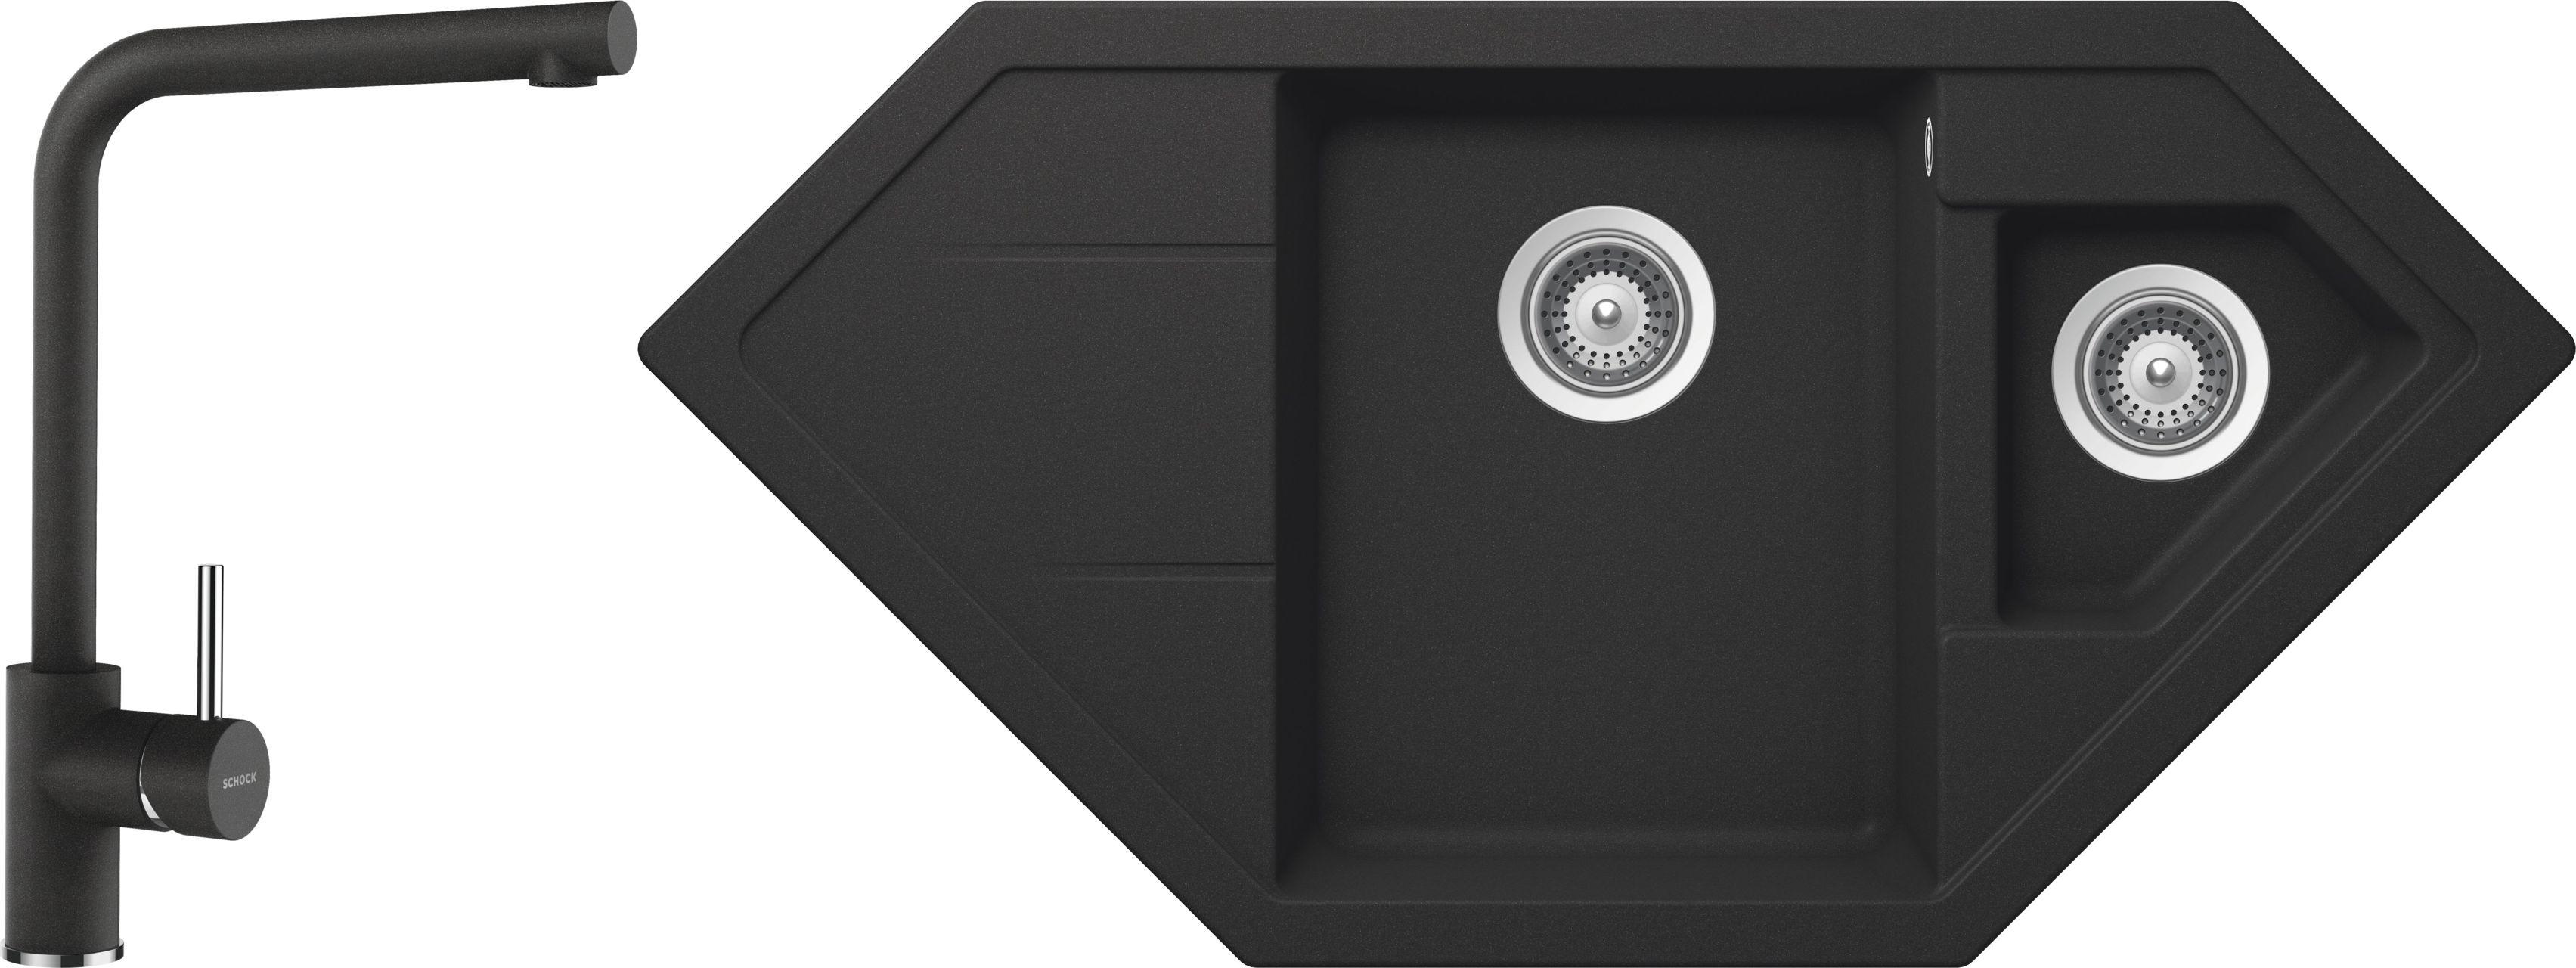 Set 38b Dřez Primus C-150 Onyx + kuchyňská baterie Napos Onyx